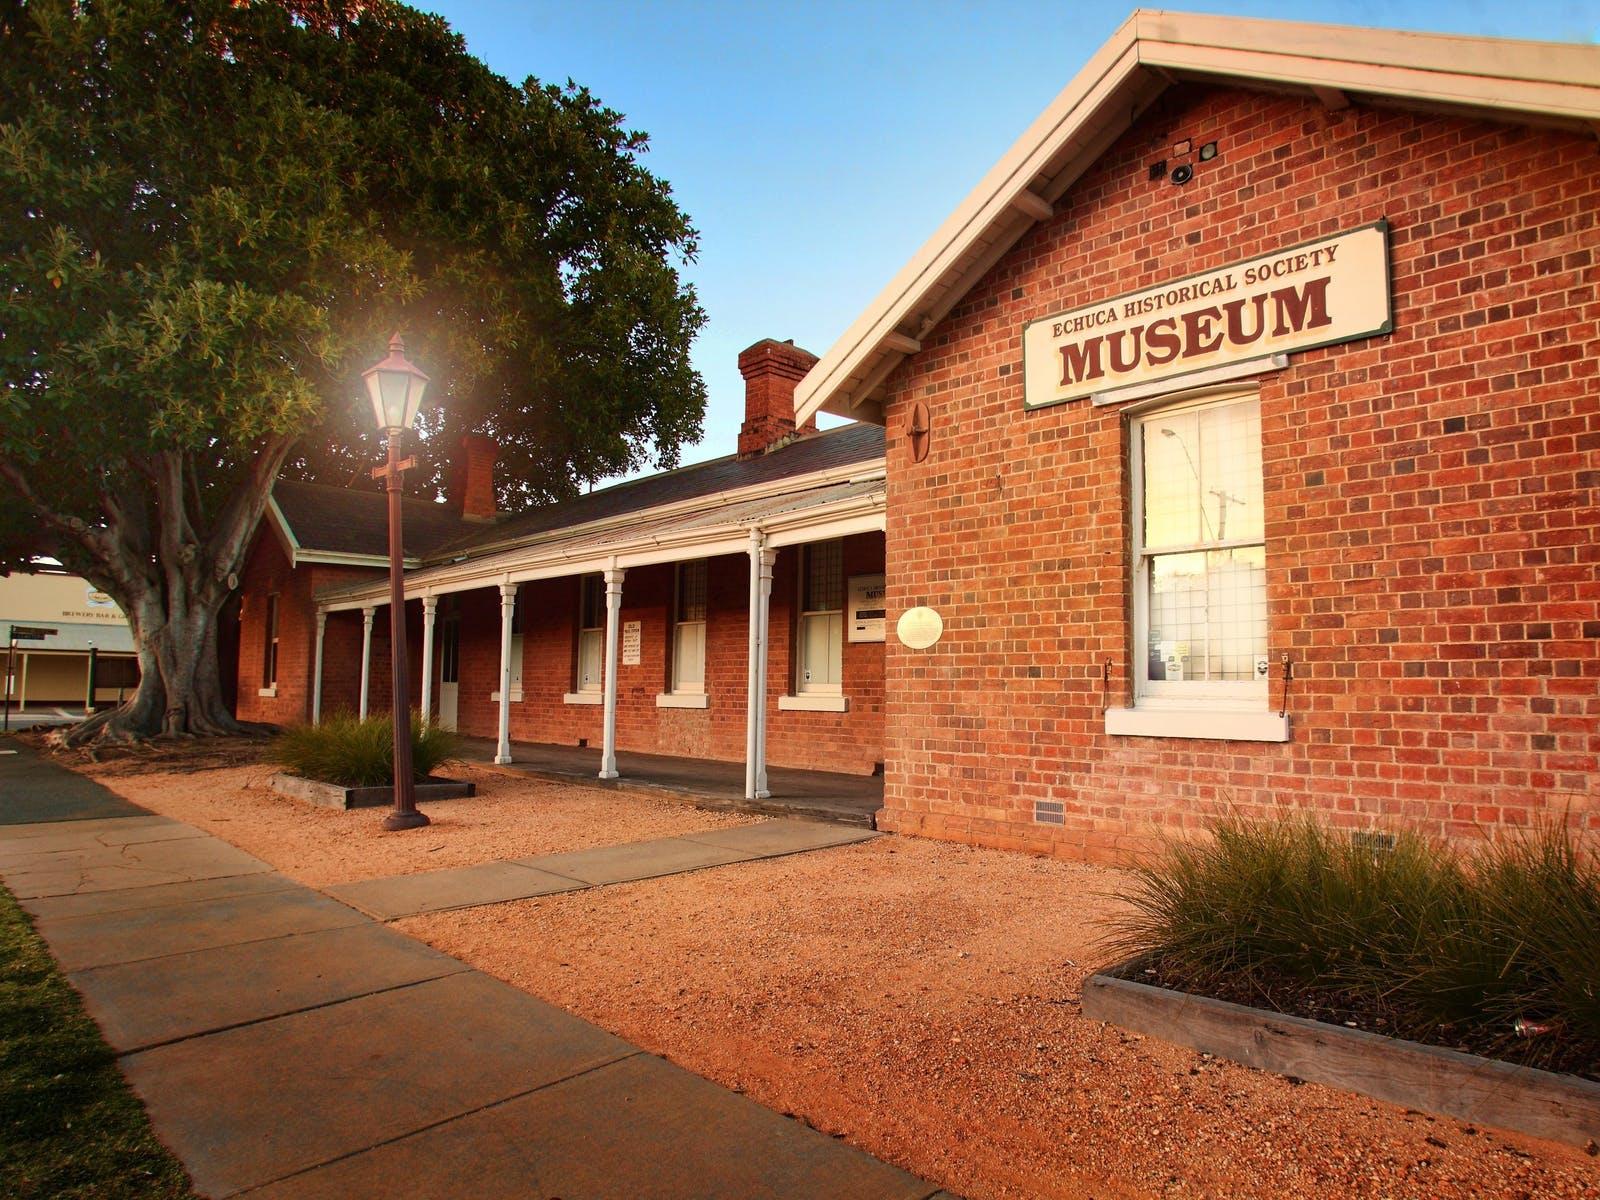 Echuca Historical Society Museum